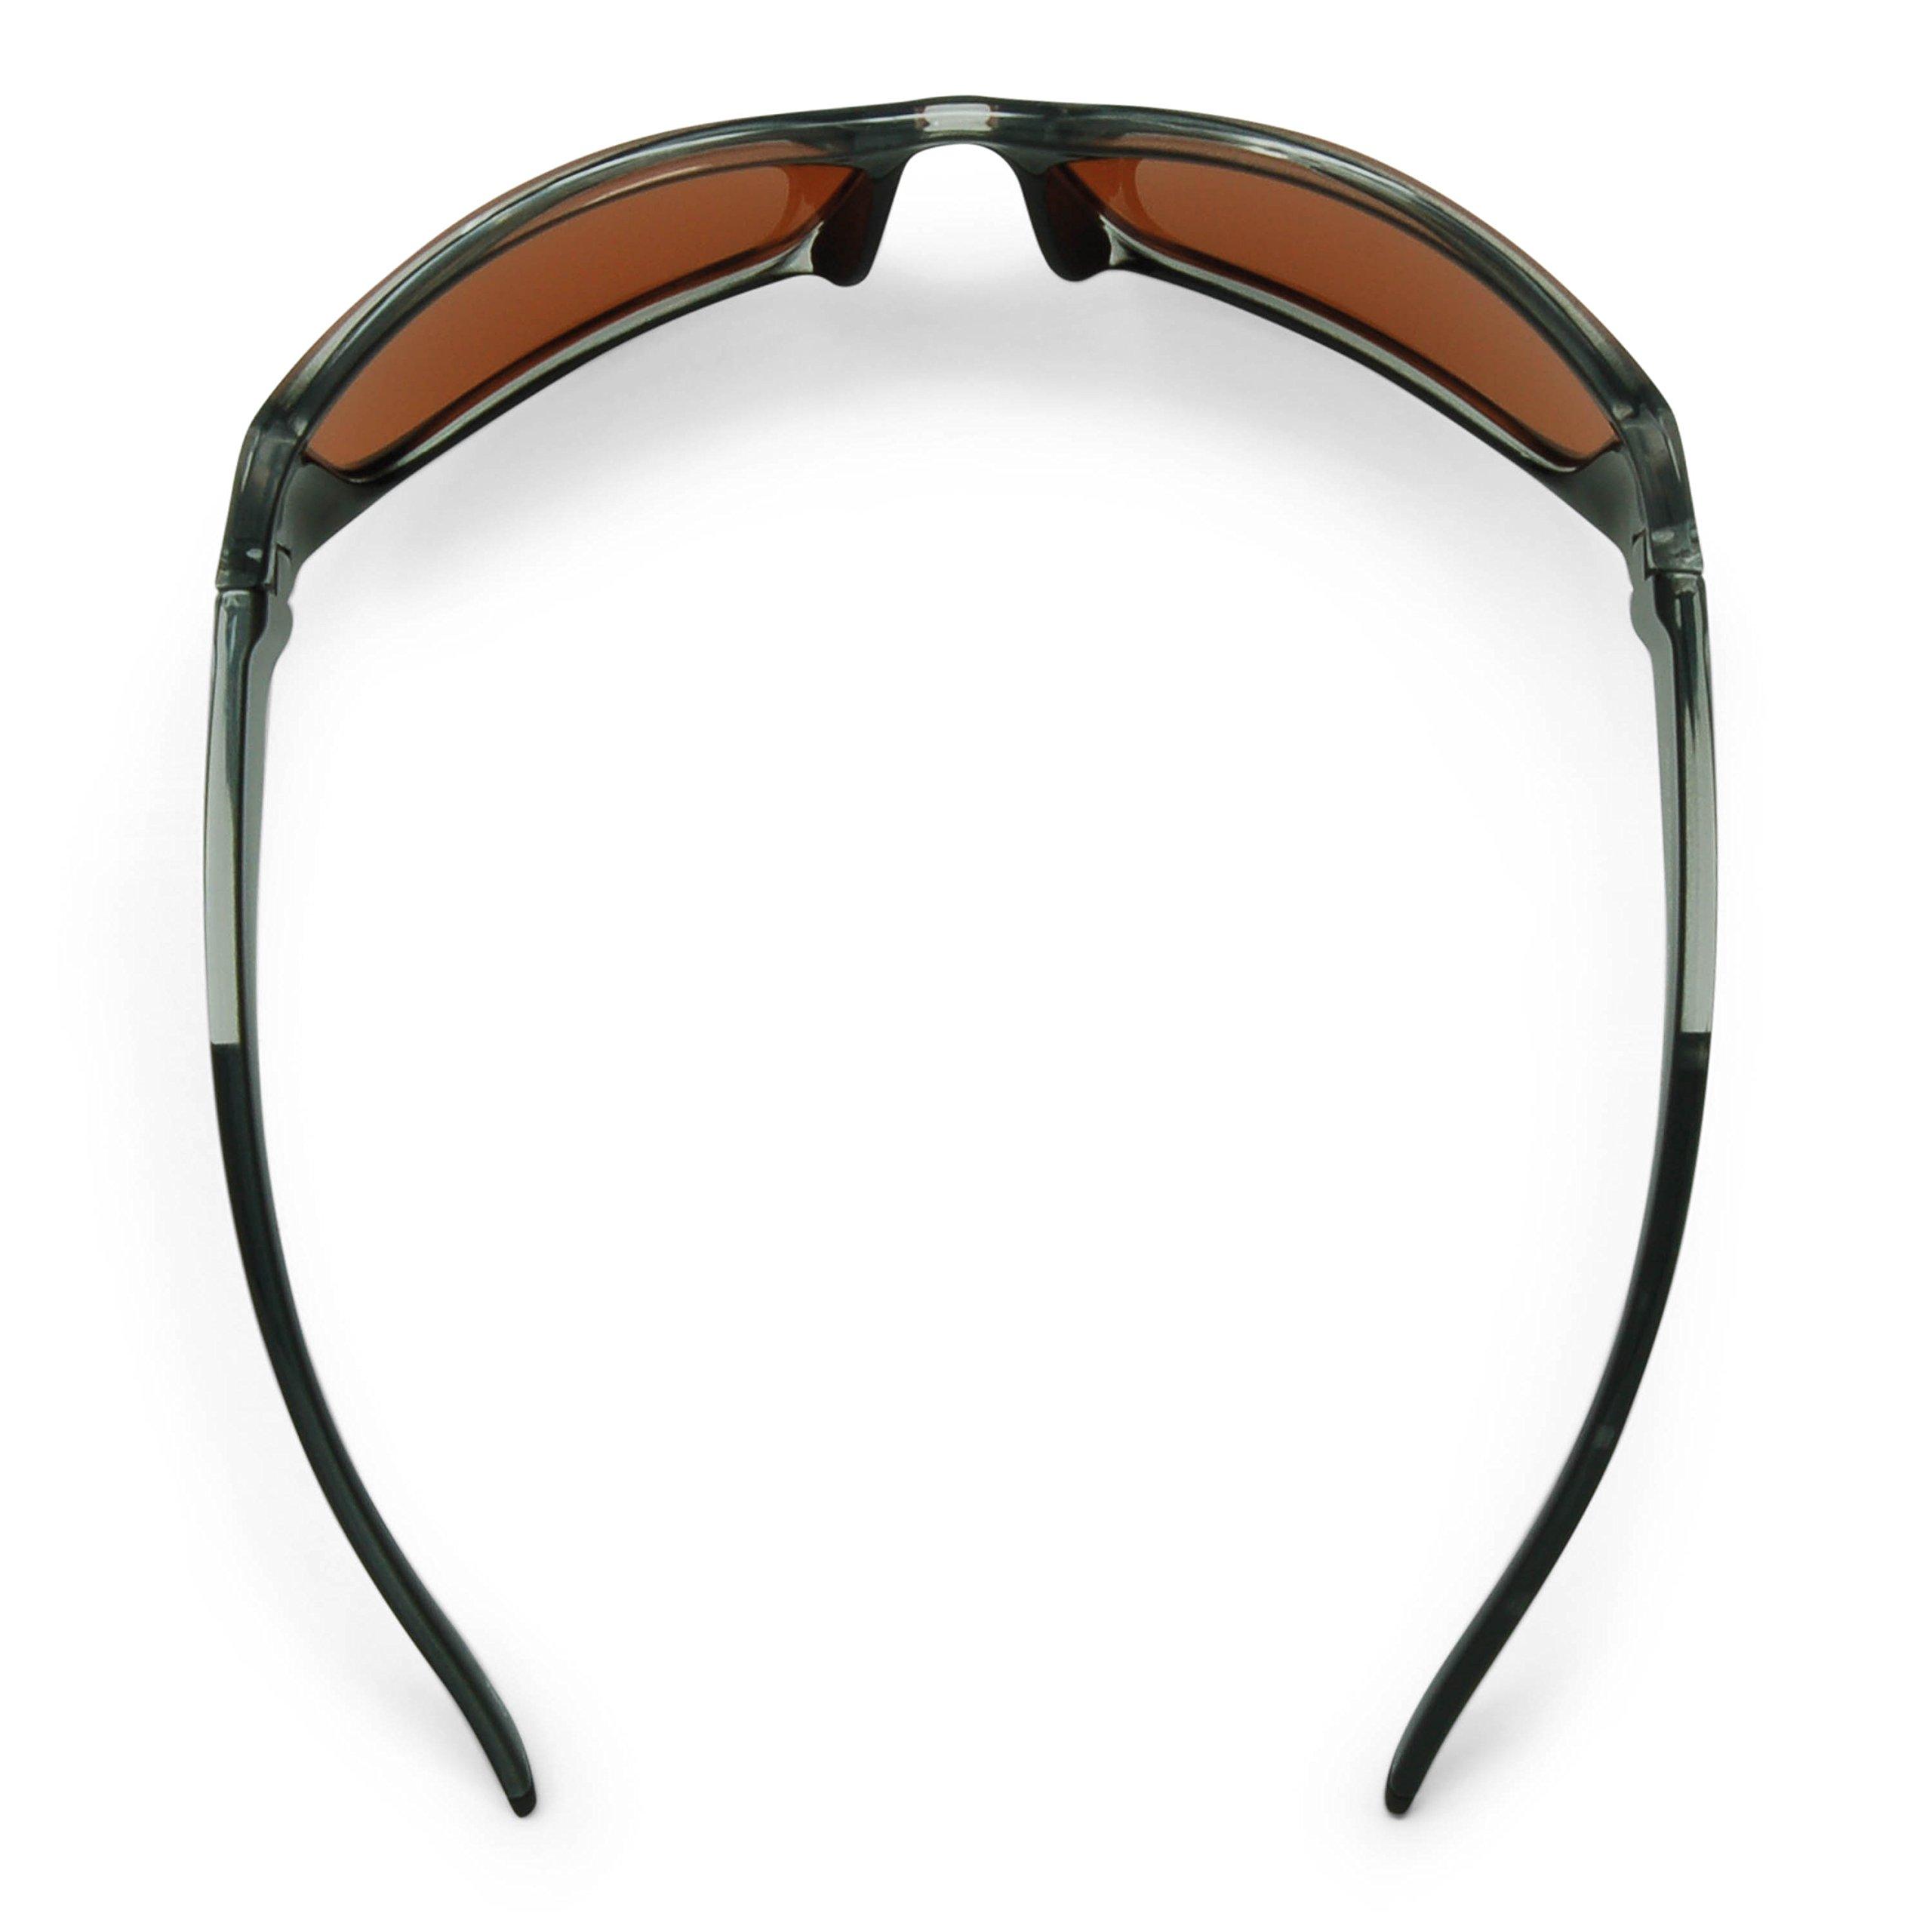 Flying Fisherman Buchanan Polarized Sunglasses by Flying Fisherman